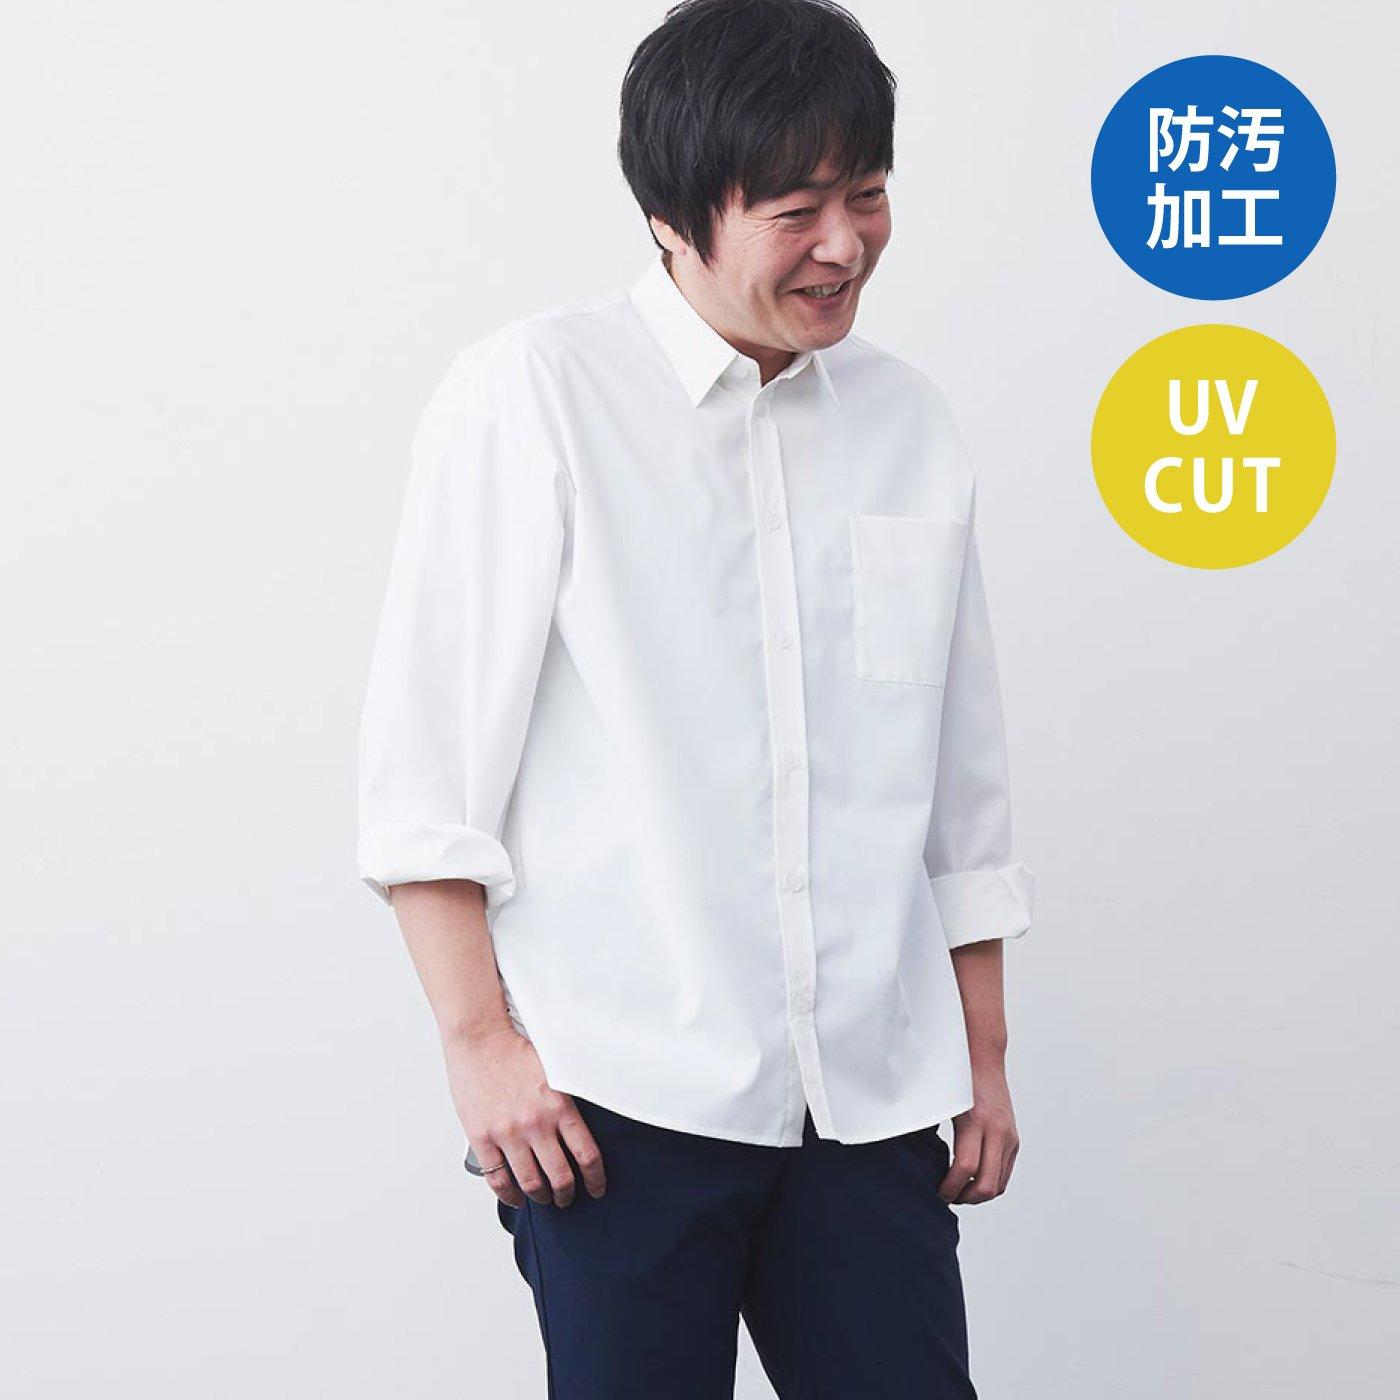 IEDIT[イディット] UVカット&防汚加工!クレバー素材のメンズシャツ〈オフホワイト〉